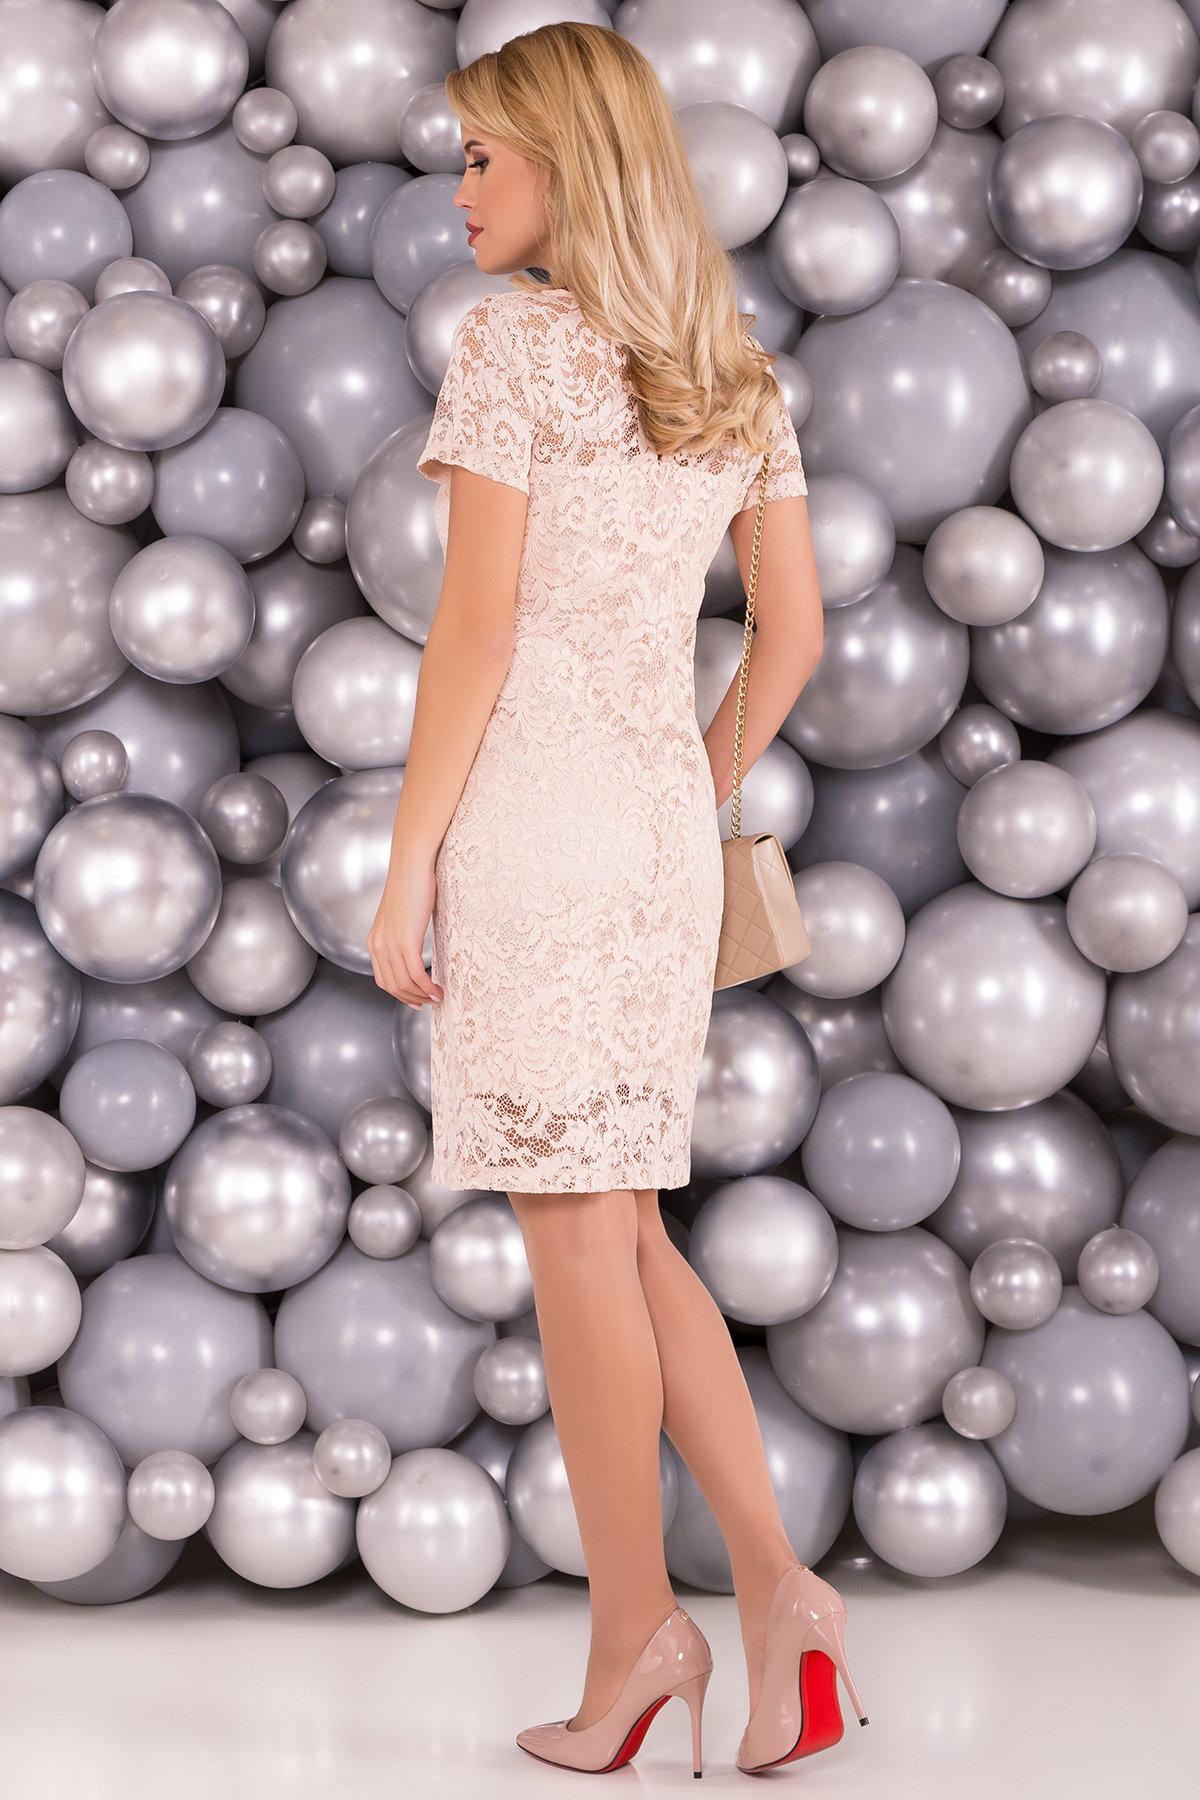 Платье Винтаж 3107 АРТ. 34278 Цвет: Бежевый - фото 2, интернет магазин tm-modus.ru